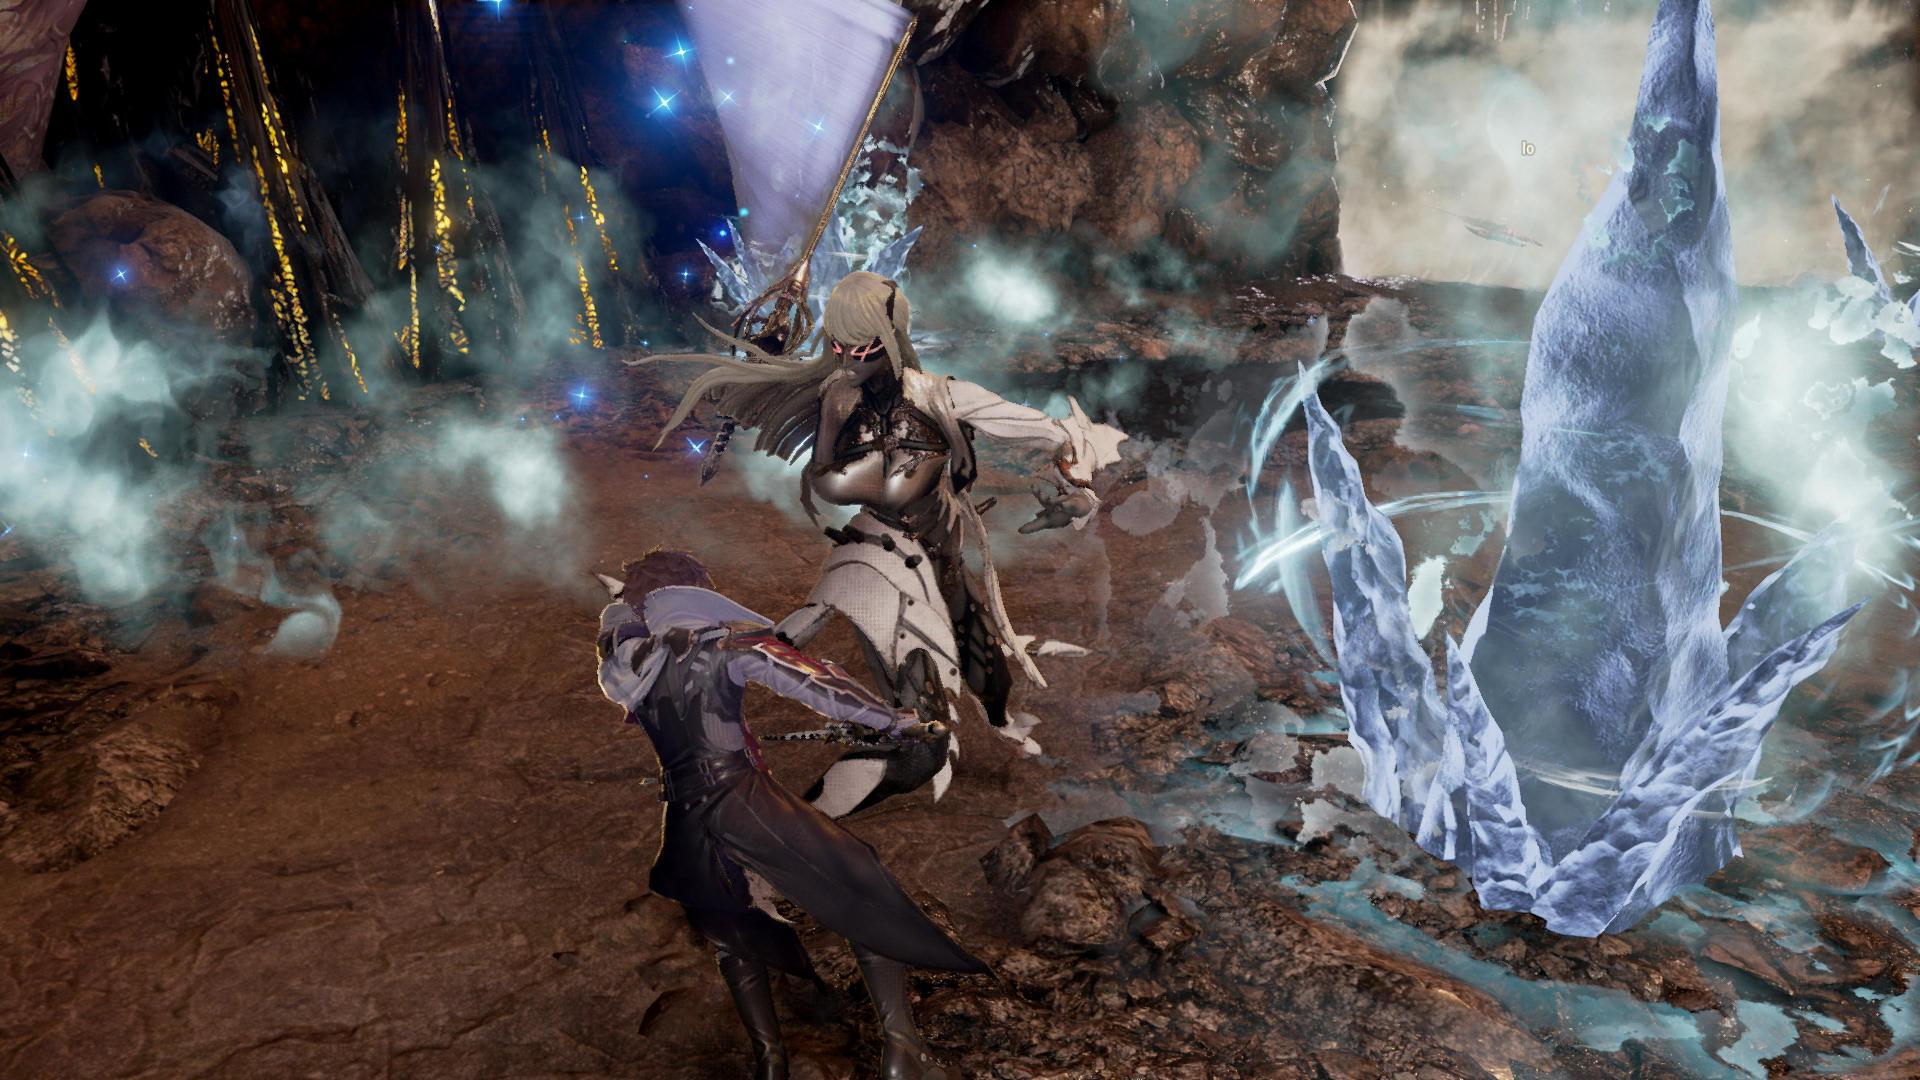 New gameplay trailer released for CODE VEIN